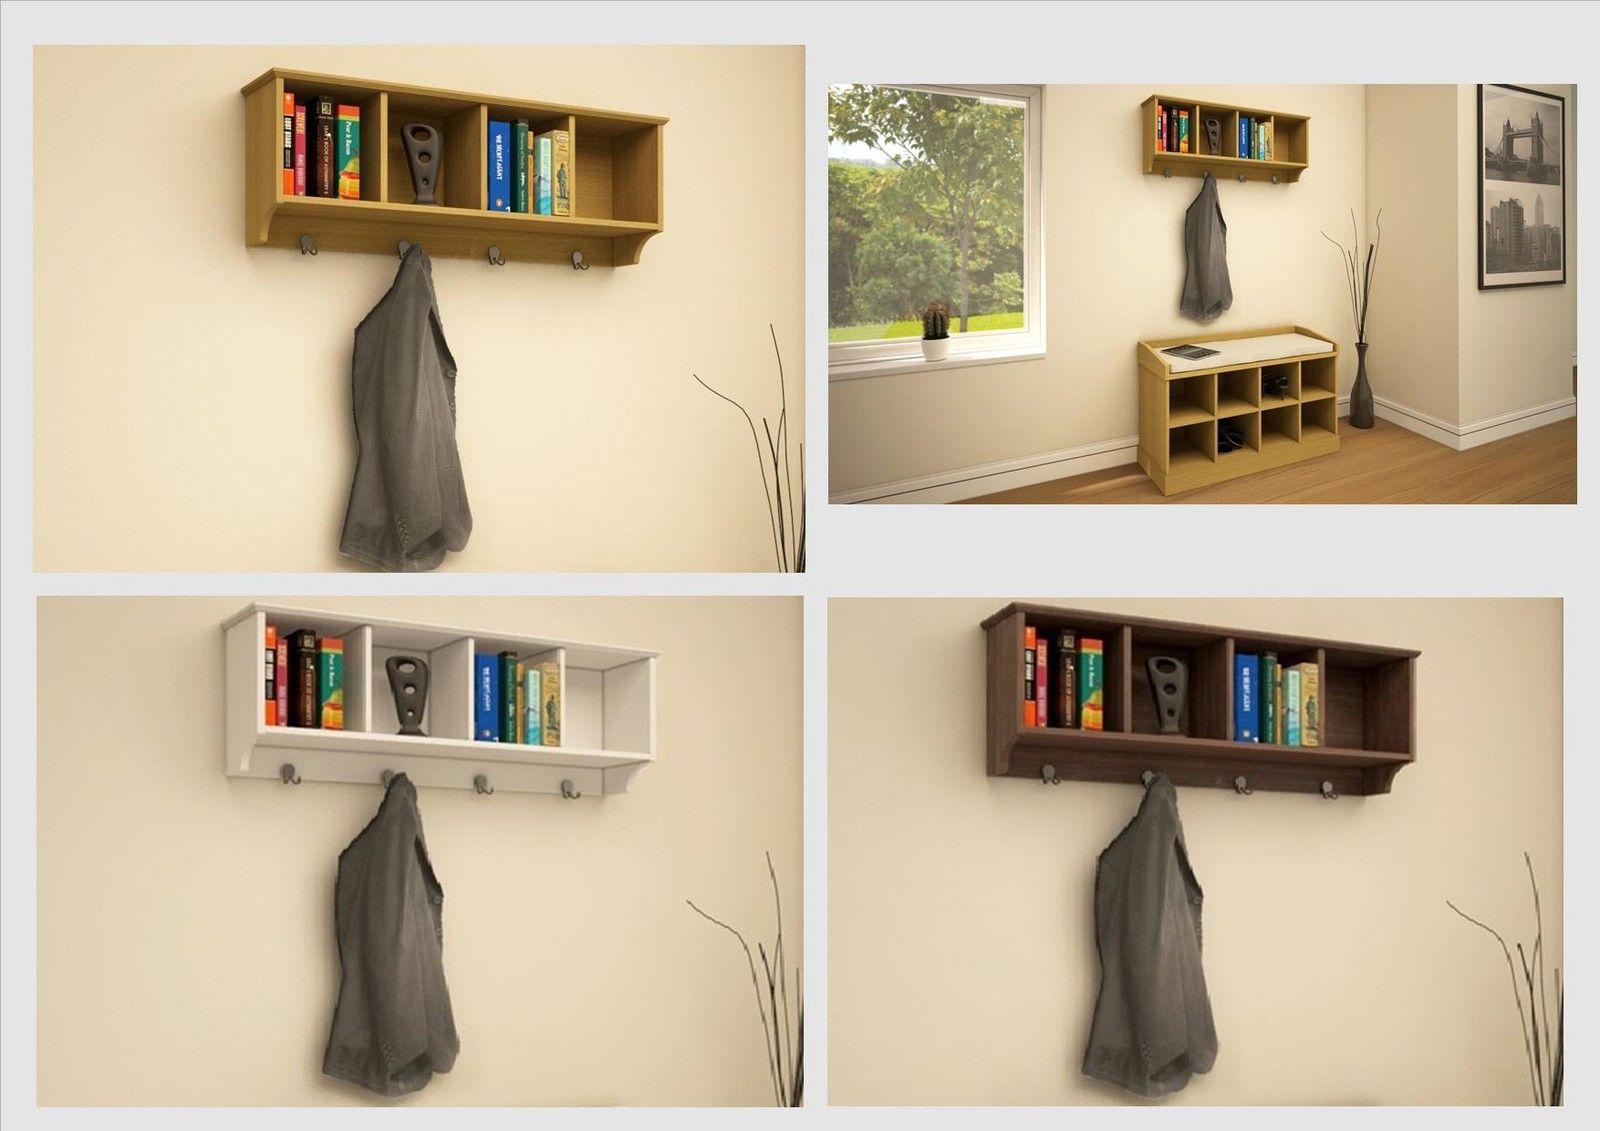 Kempton Hallway Storage Bench And Wall Storage Shelf Rack With Coat Hooks    Perfect Shoe Storage Unit ...